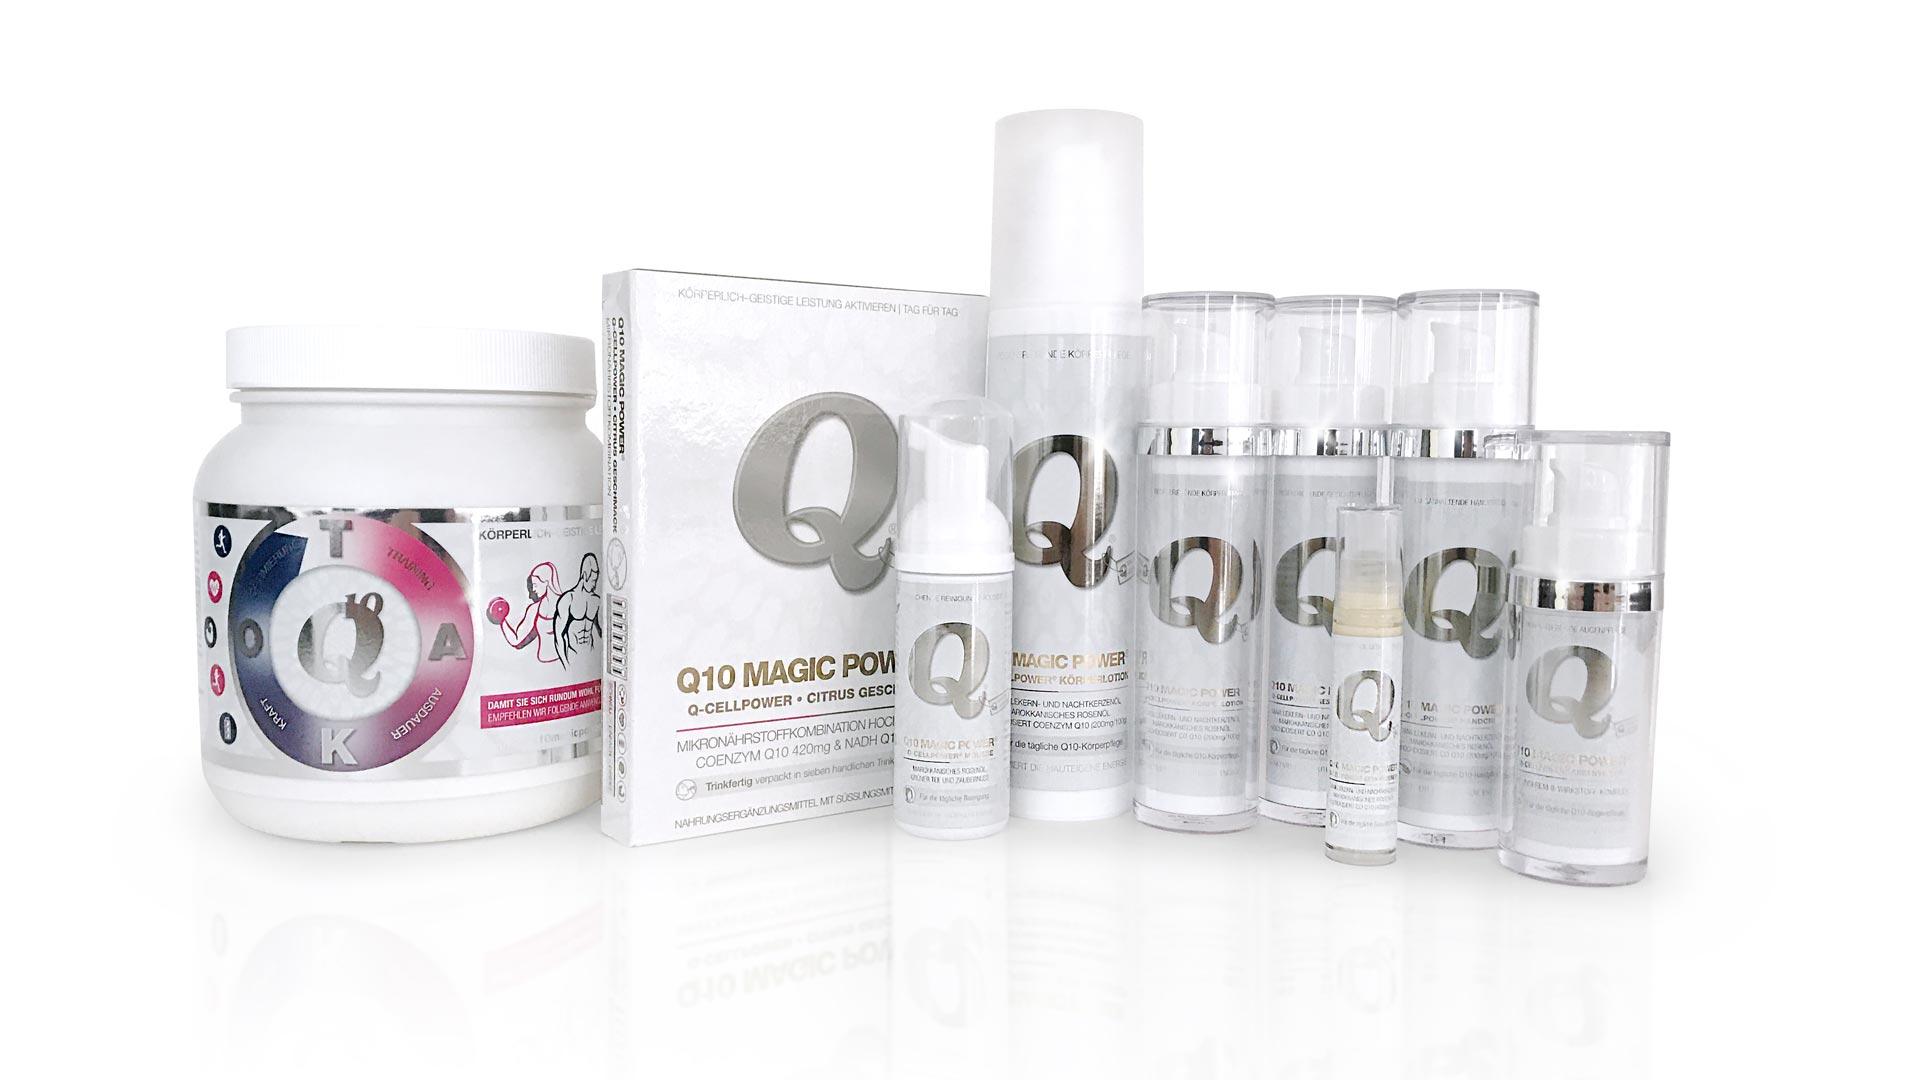 Q10 Magic Power Produktfamilie